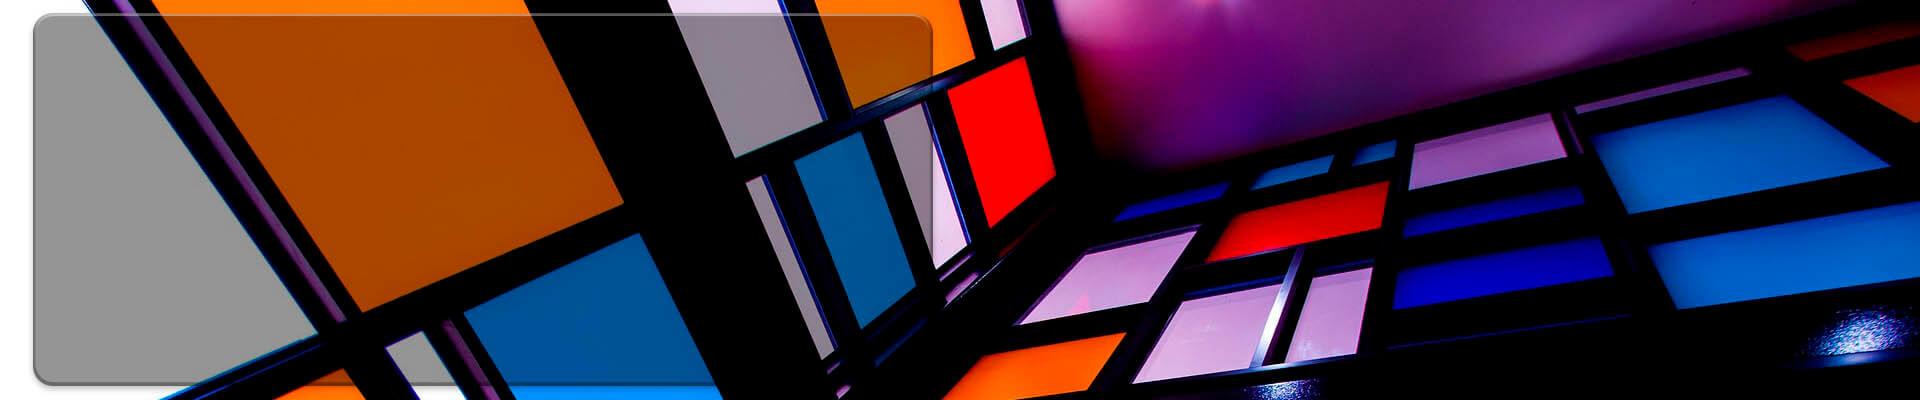 Slide de vidrio laminado decorativo Decorss